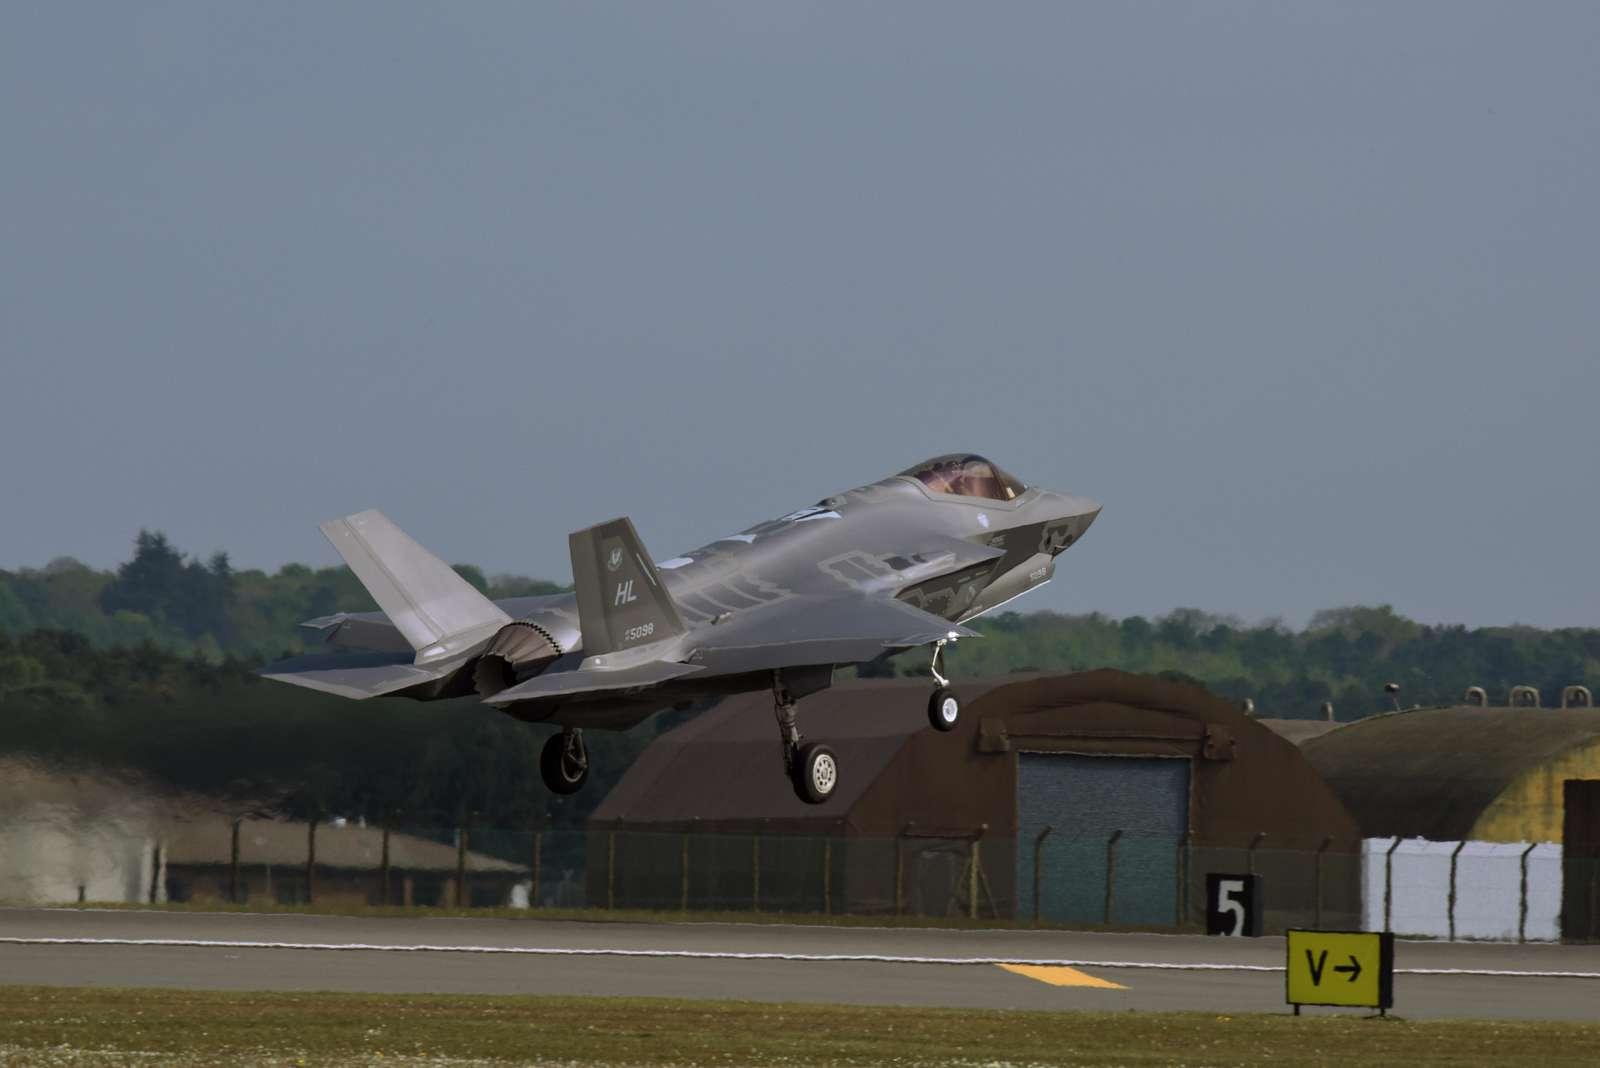 Lockheed Martin F-35A Lightning II   (sn 14-5098)